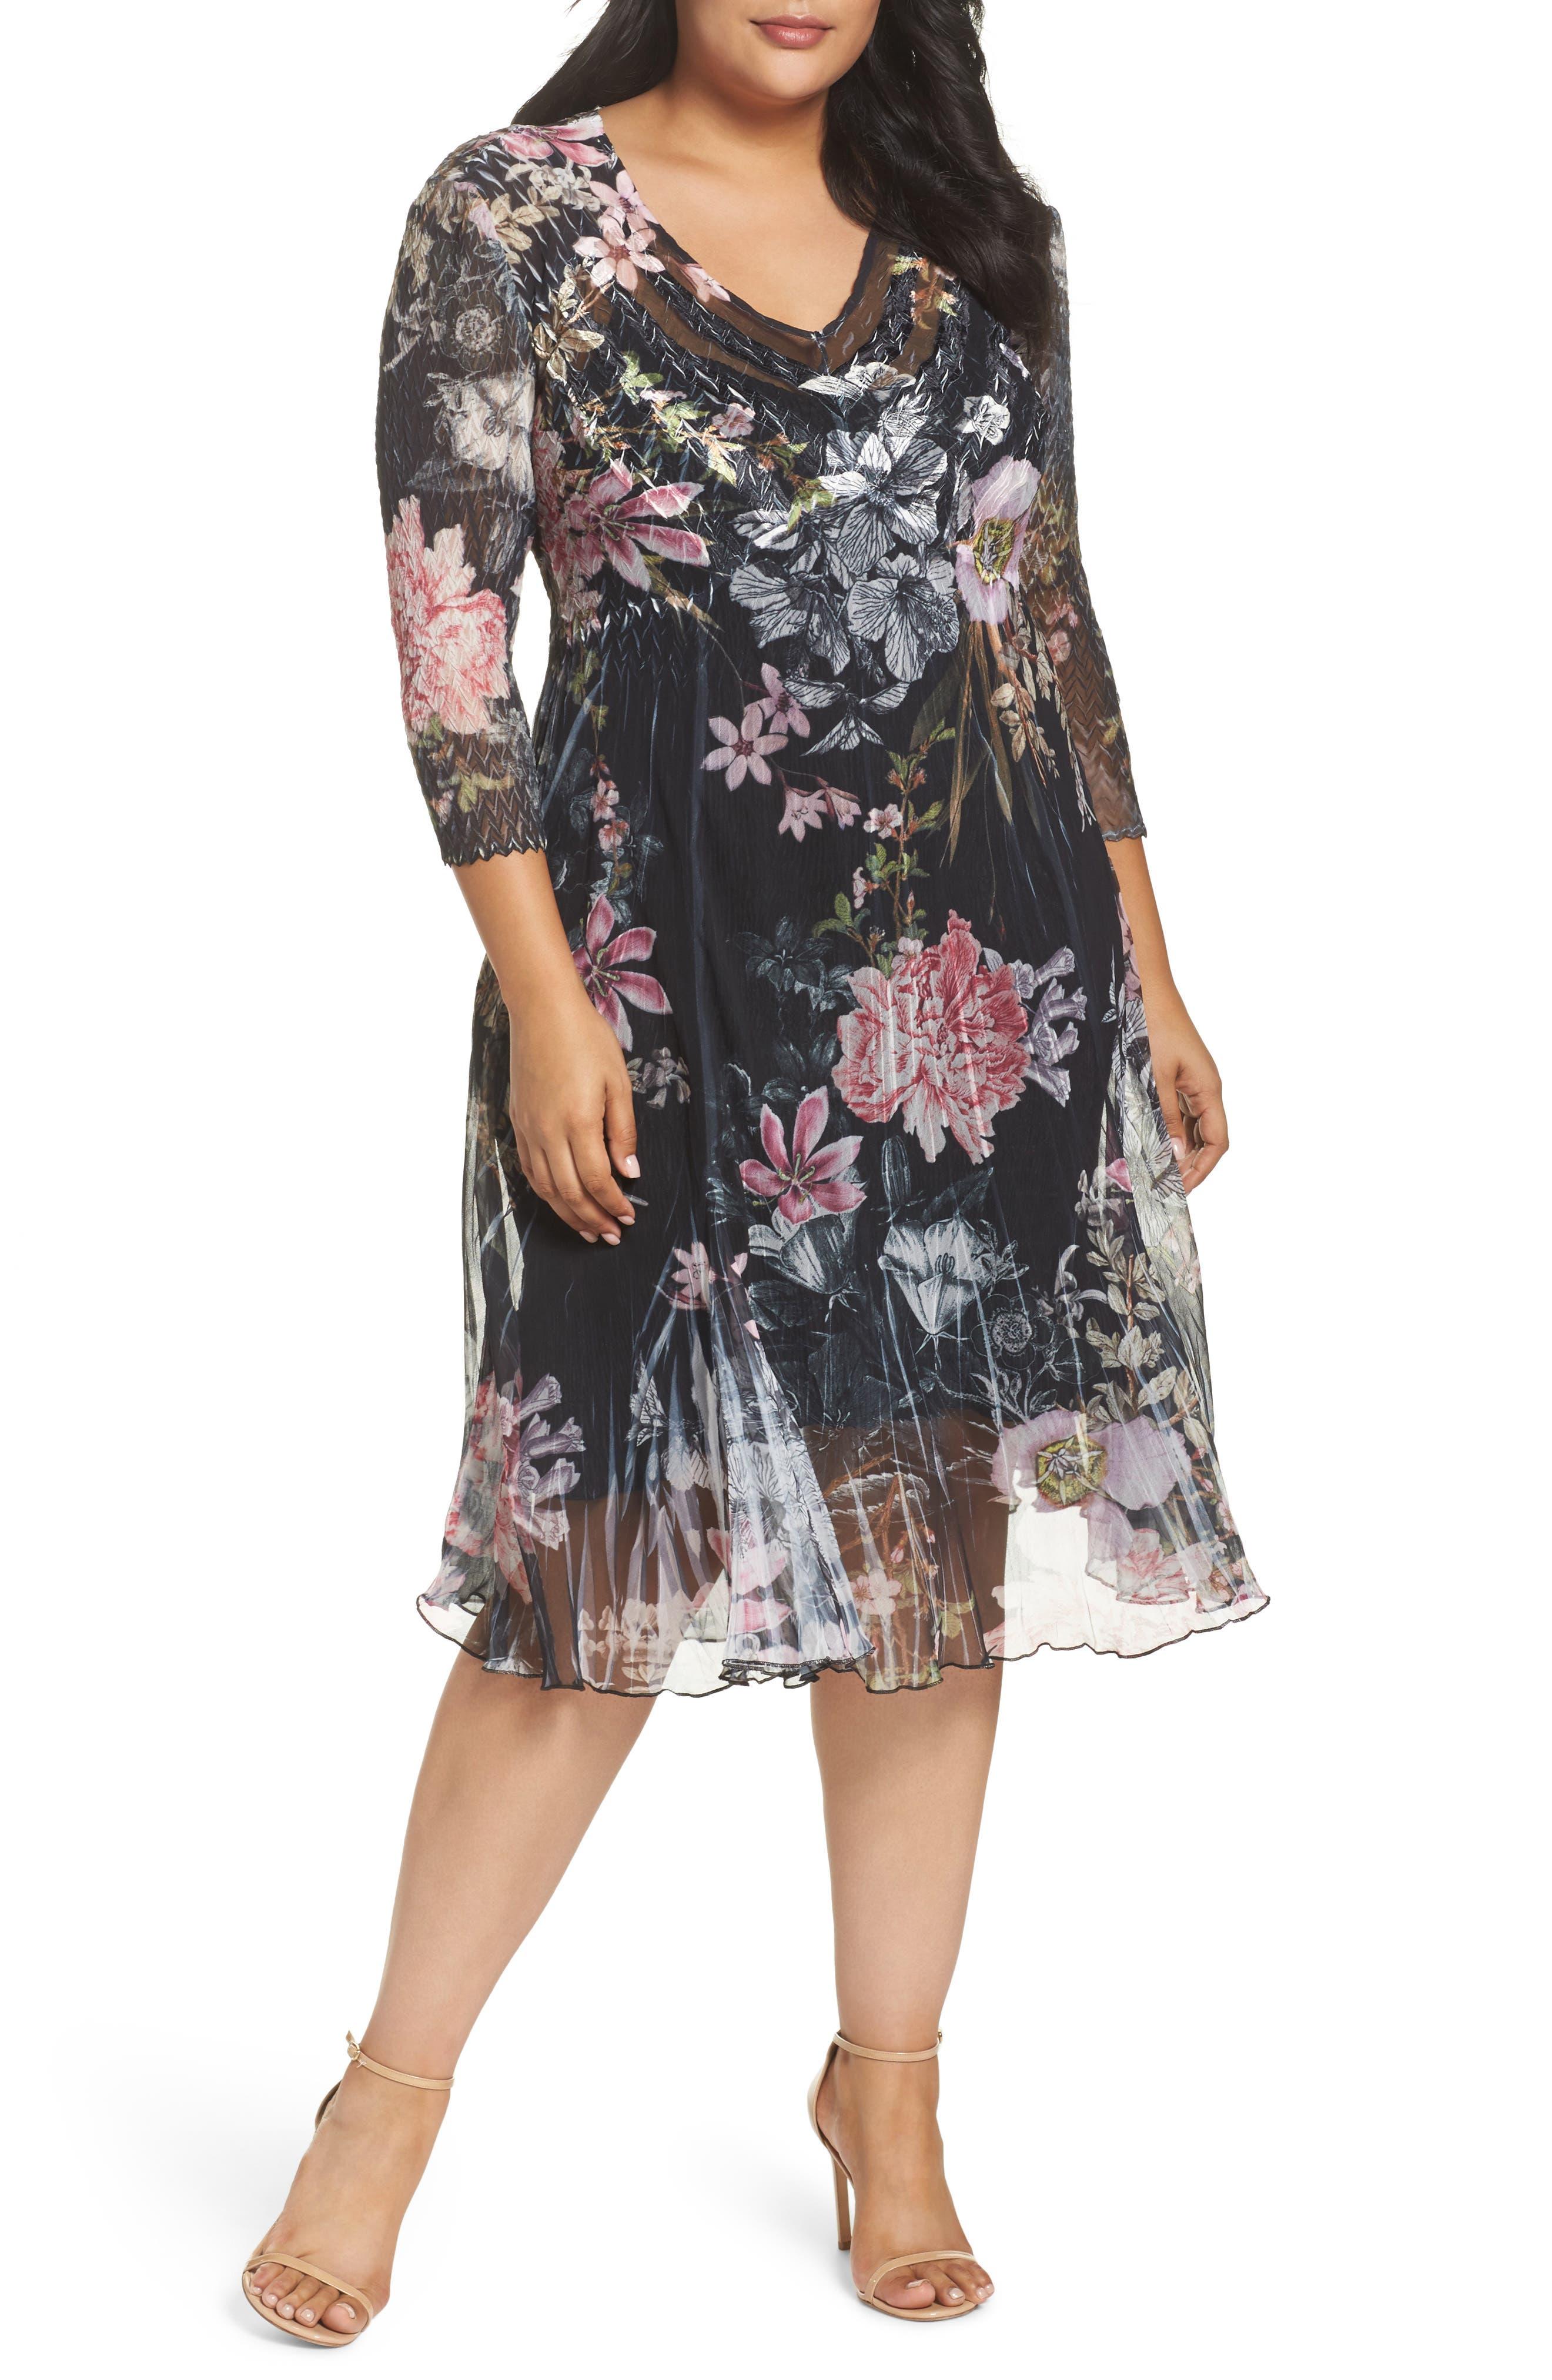 Kamarov Floral Charmeuse & Chiffon Floral A-Line Dress (Plus Size)